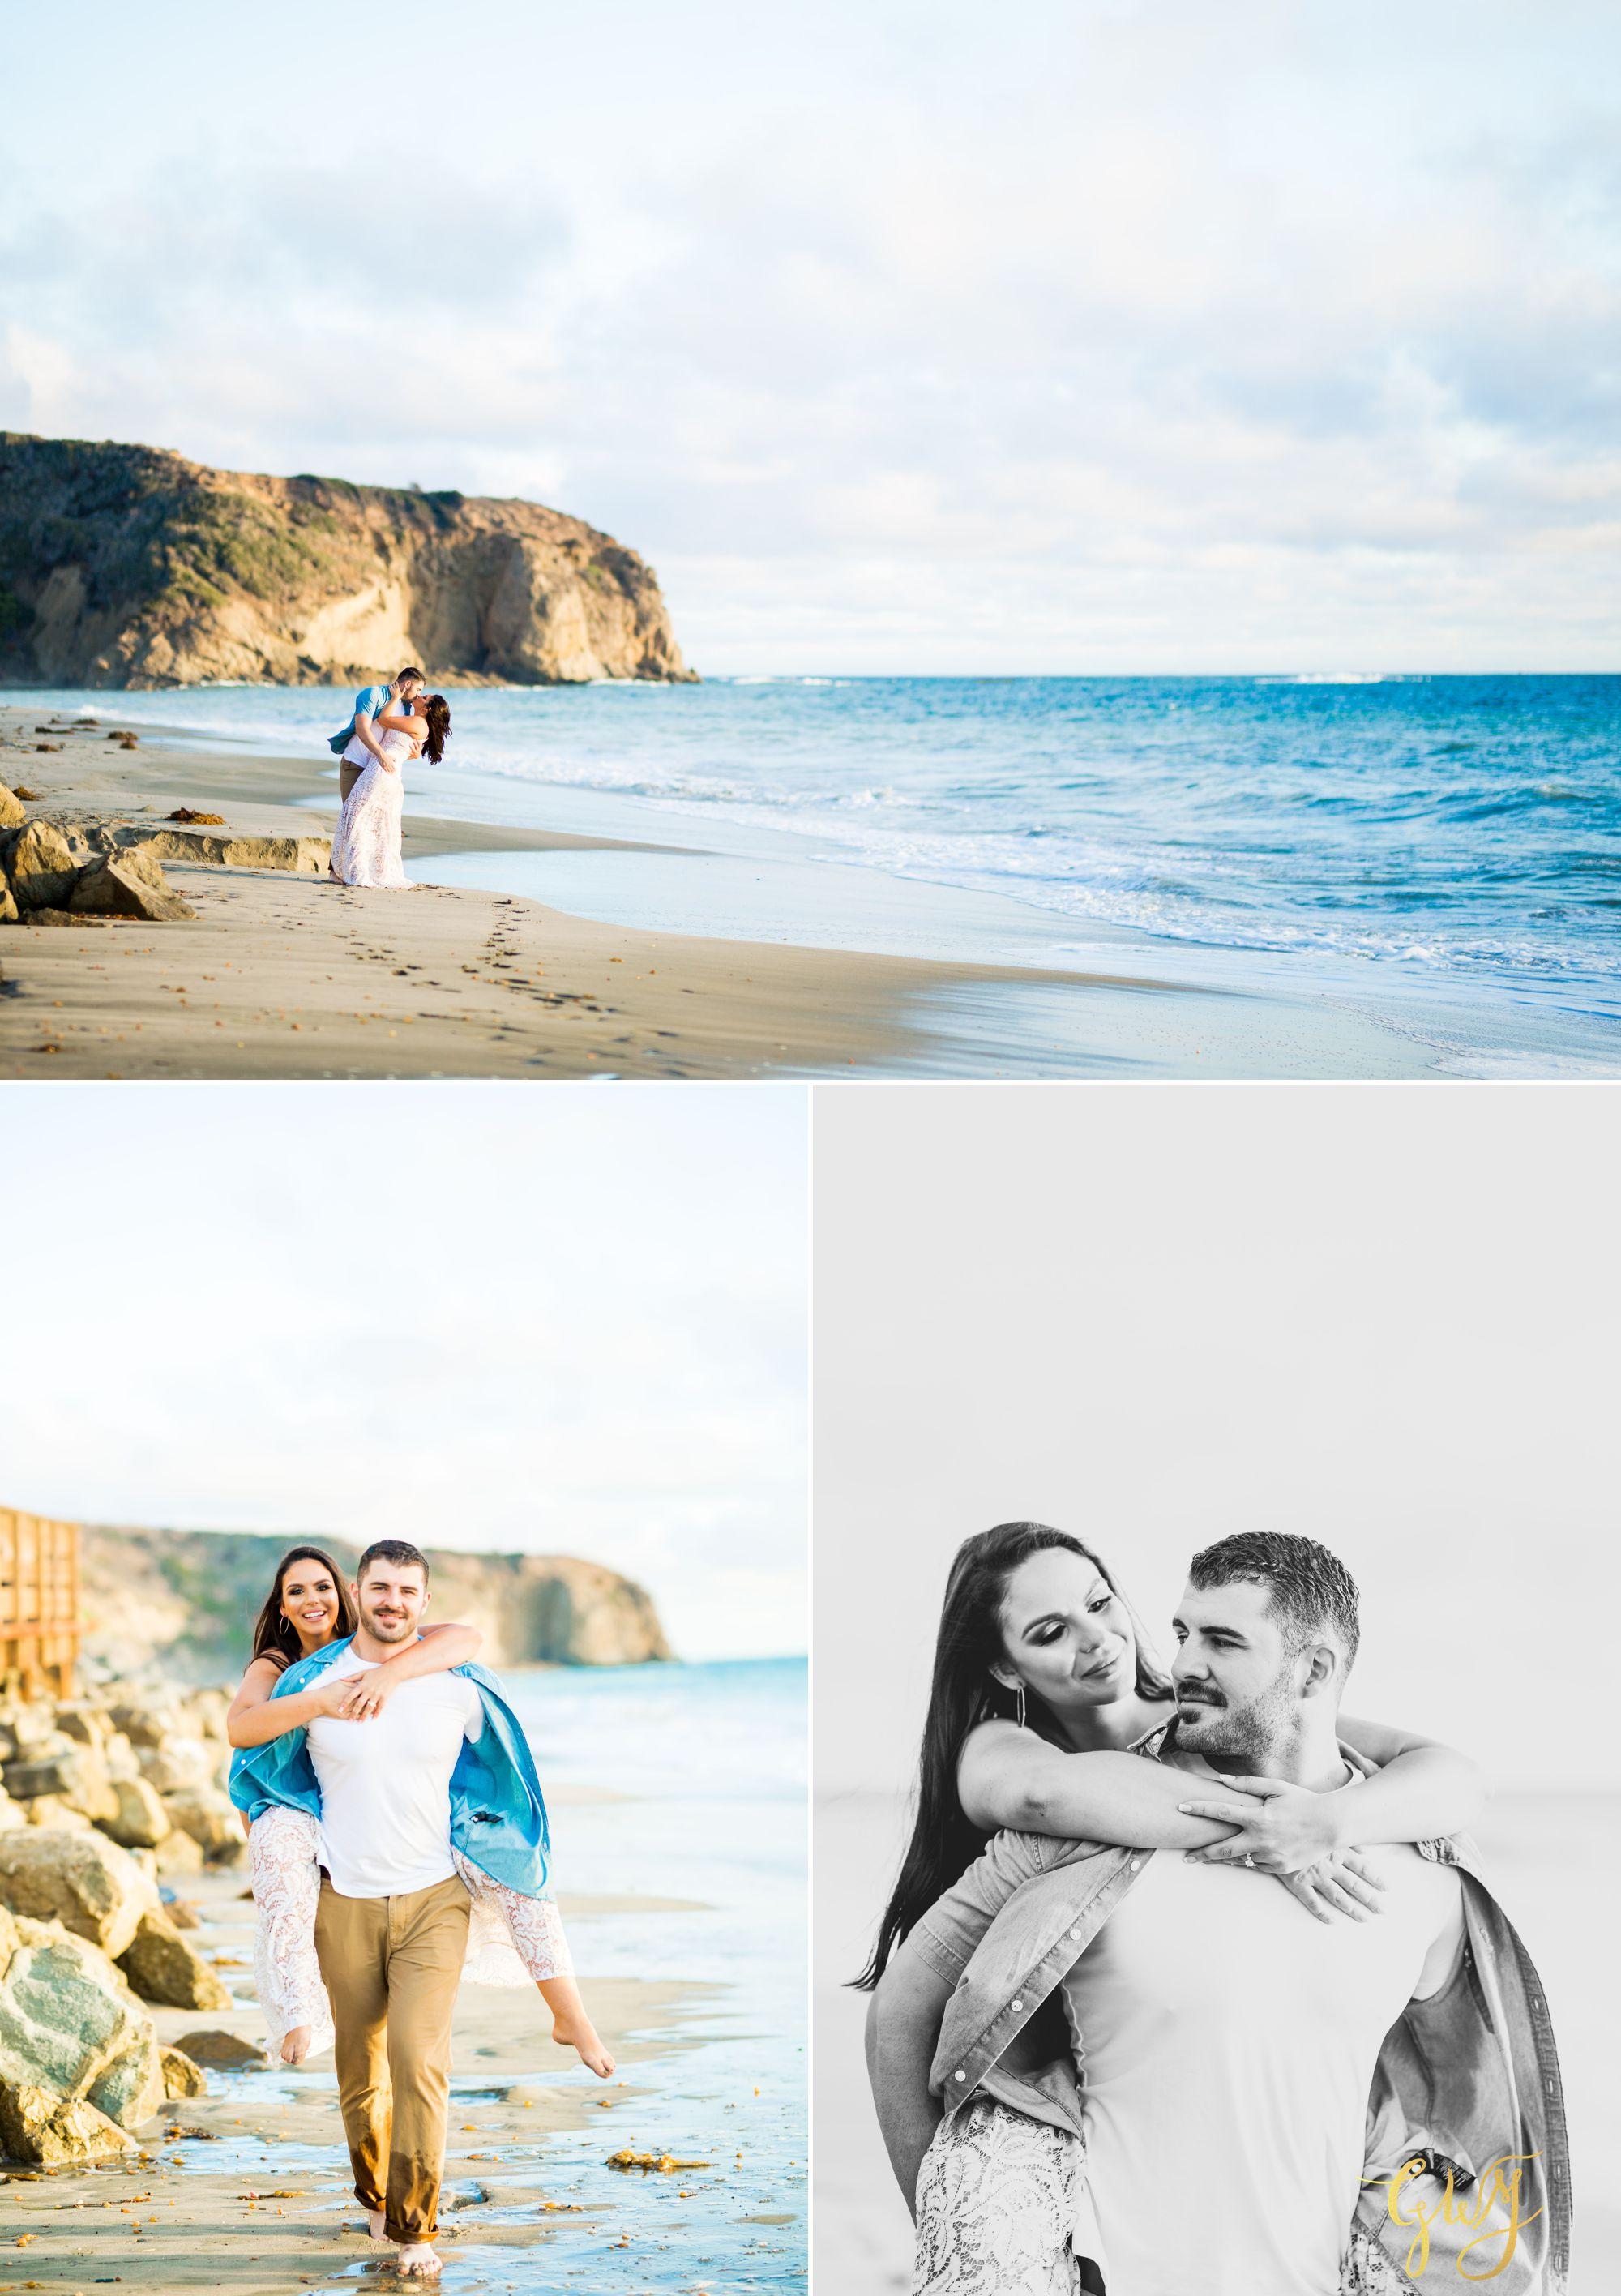 Alejandro + Rachel Mission San Juan Capistrano Strands Beach Dana Point Sunset Engagement by Glass Woods Media 10.jpg